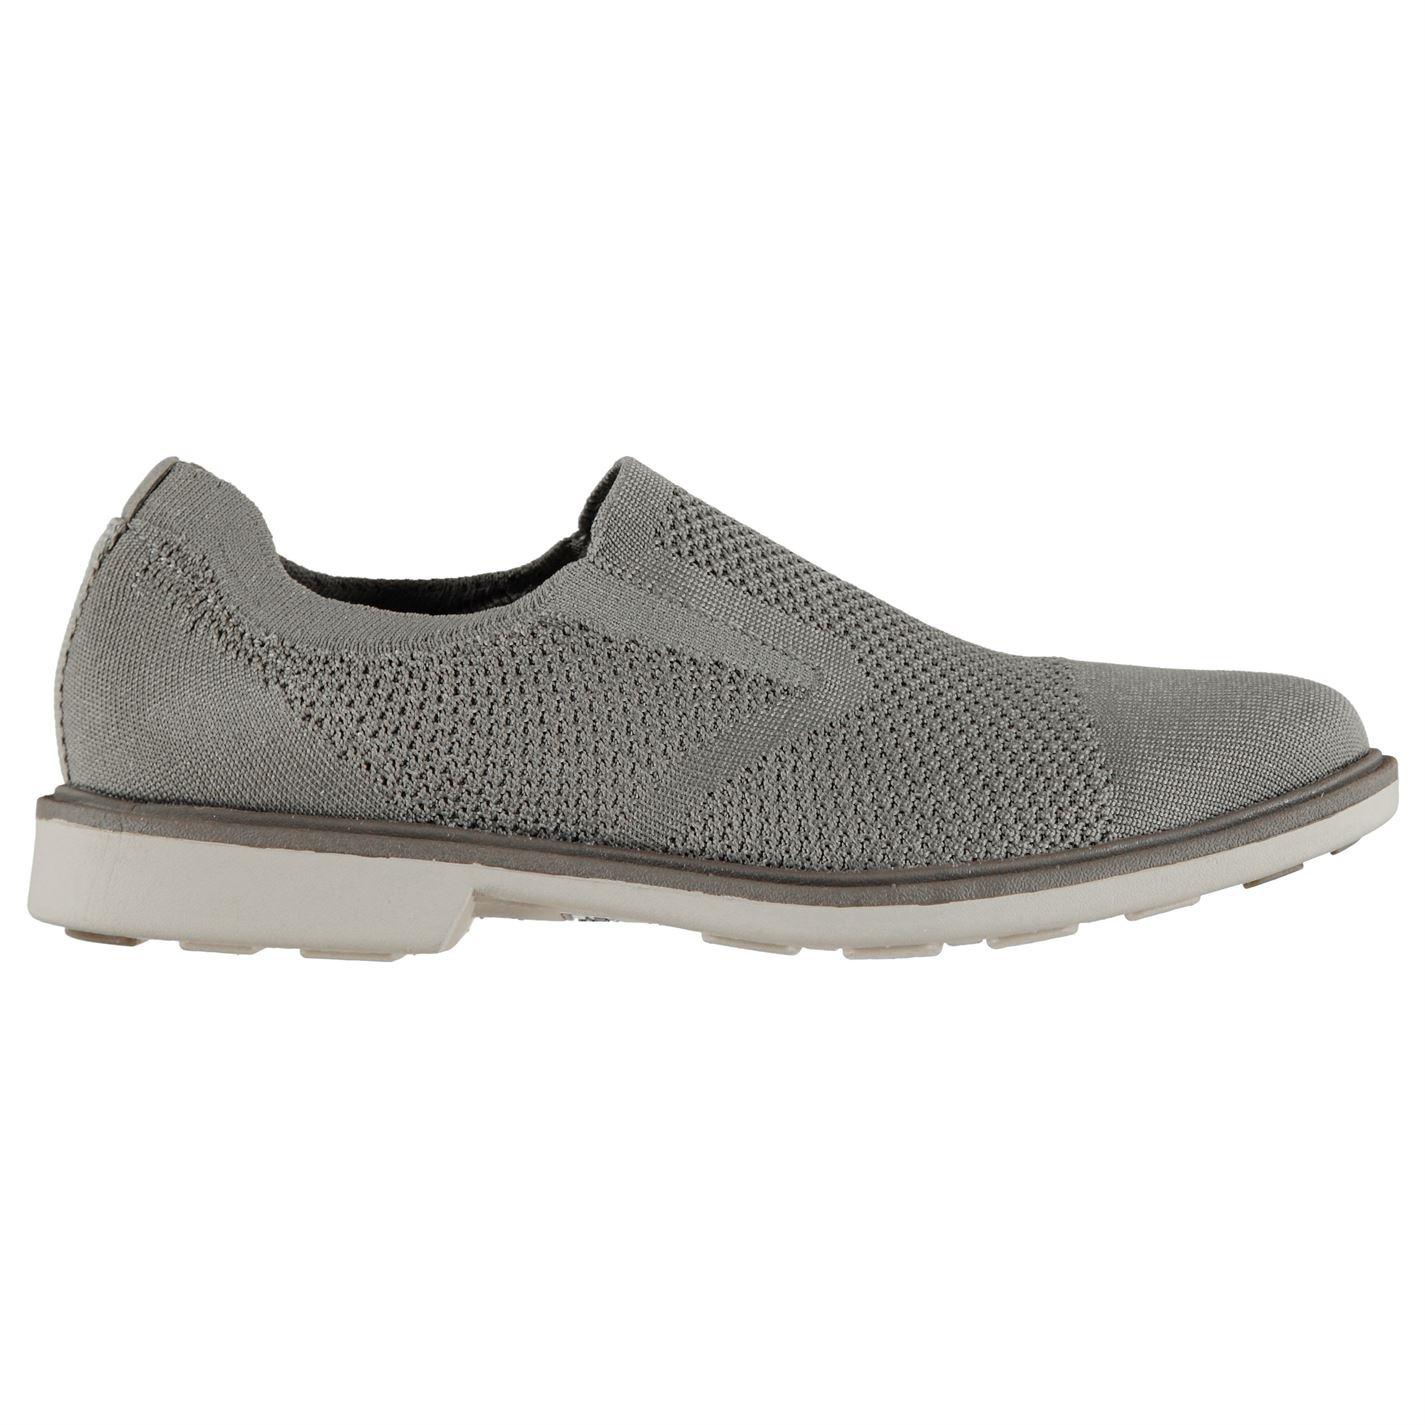 Mens Mark Nason Monza Casual Shoes Slip